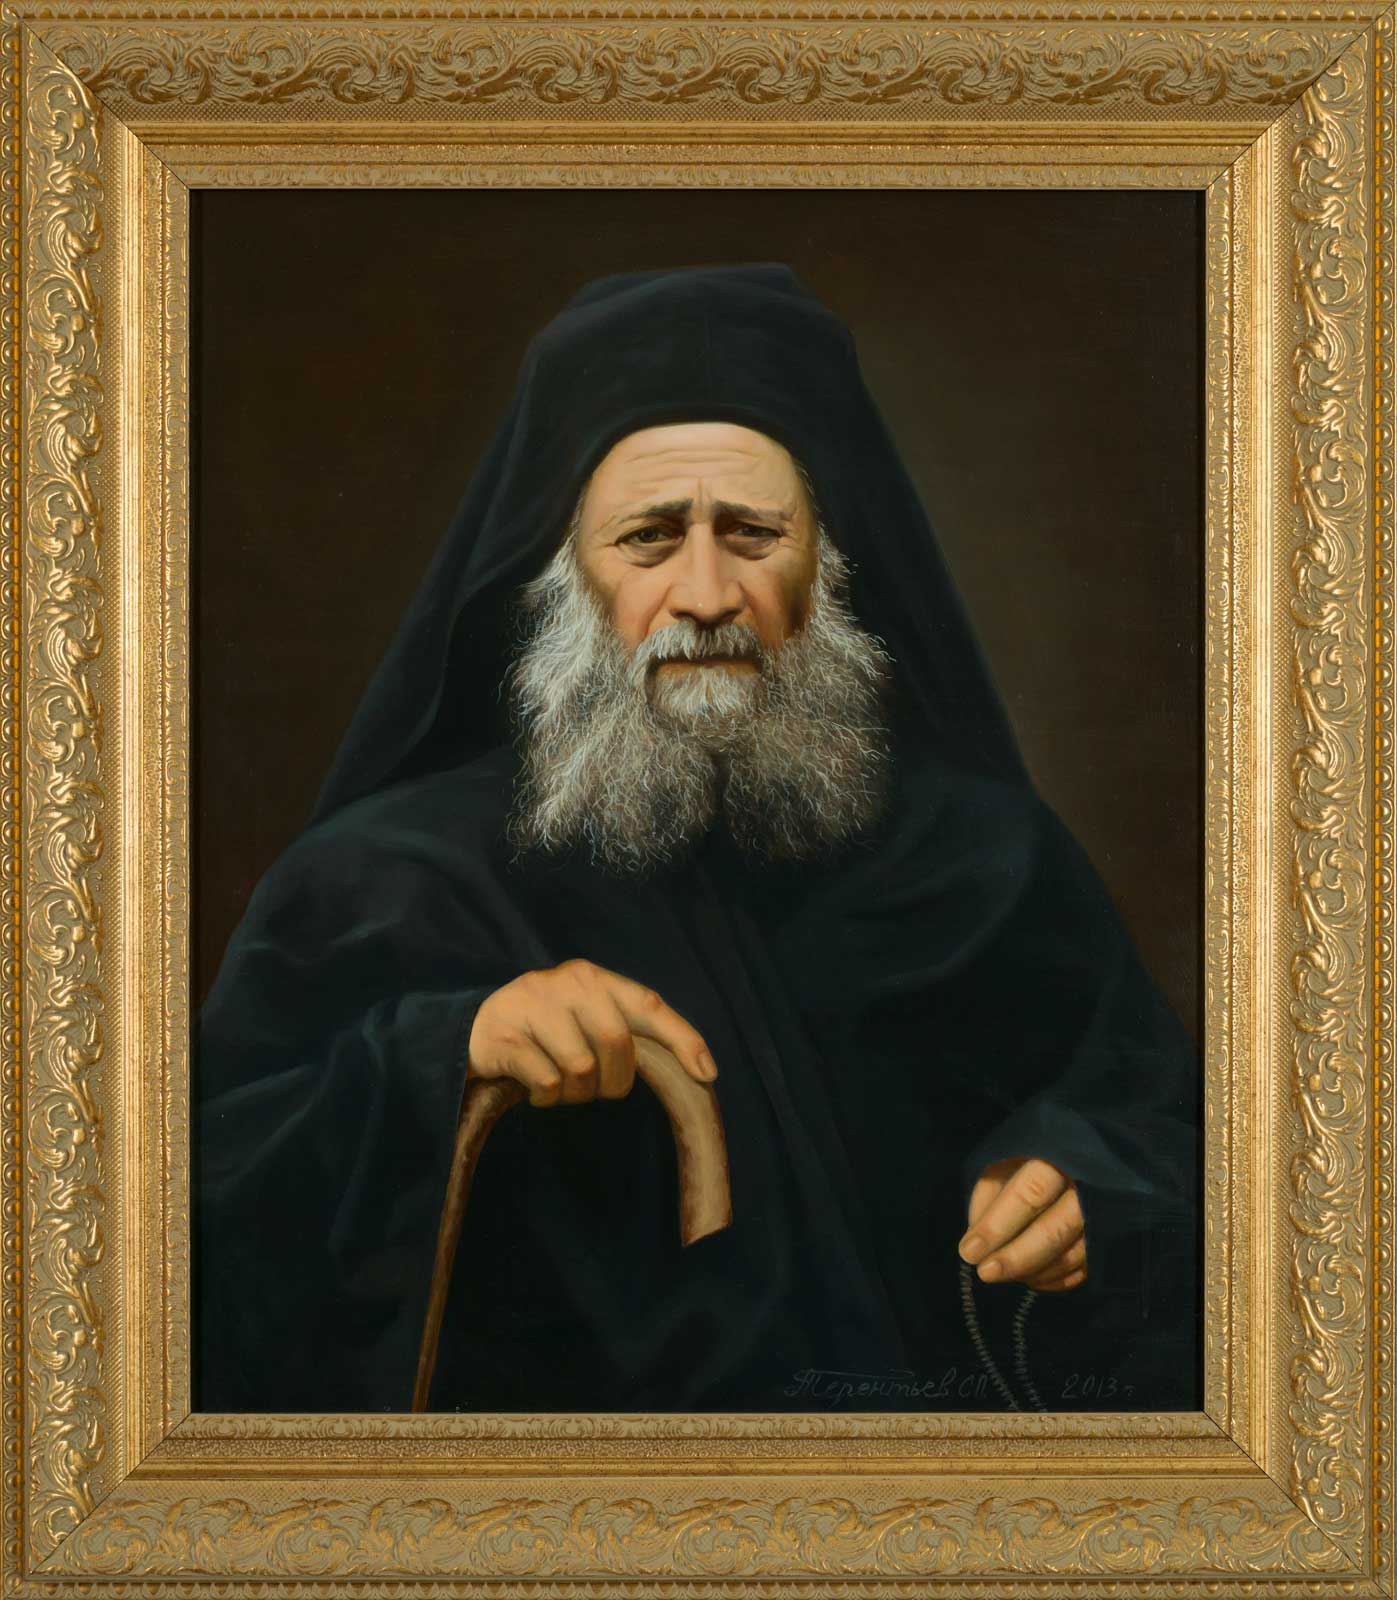 Elder Joseph Hesycast, Elders Daniil and Ephraim of Katounakia to officialy enter today in the Church's Calendar